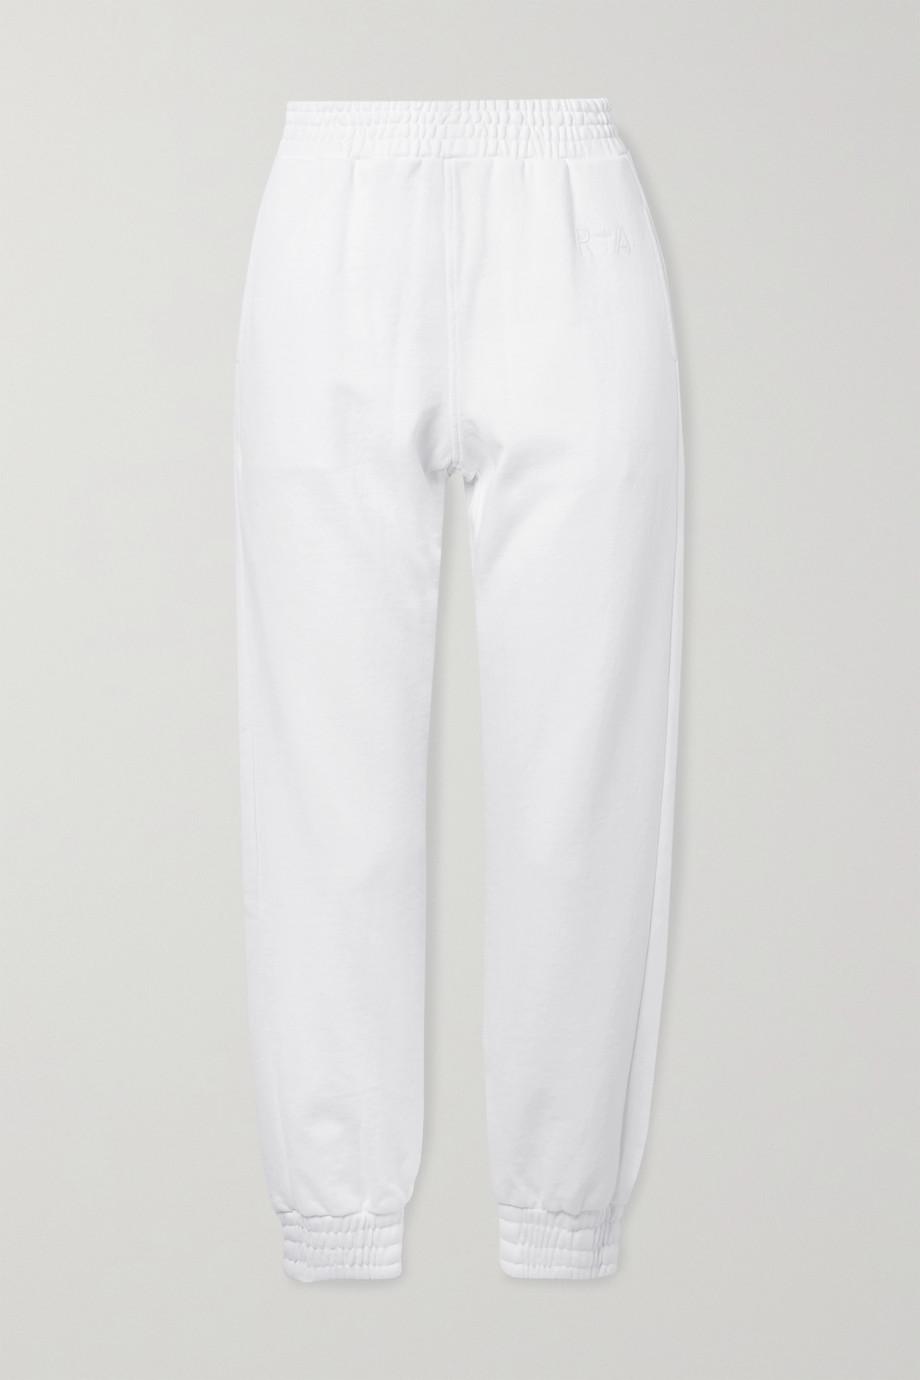 RtA Sydney 纯棉平纹布运动裤